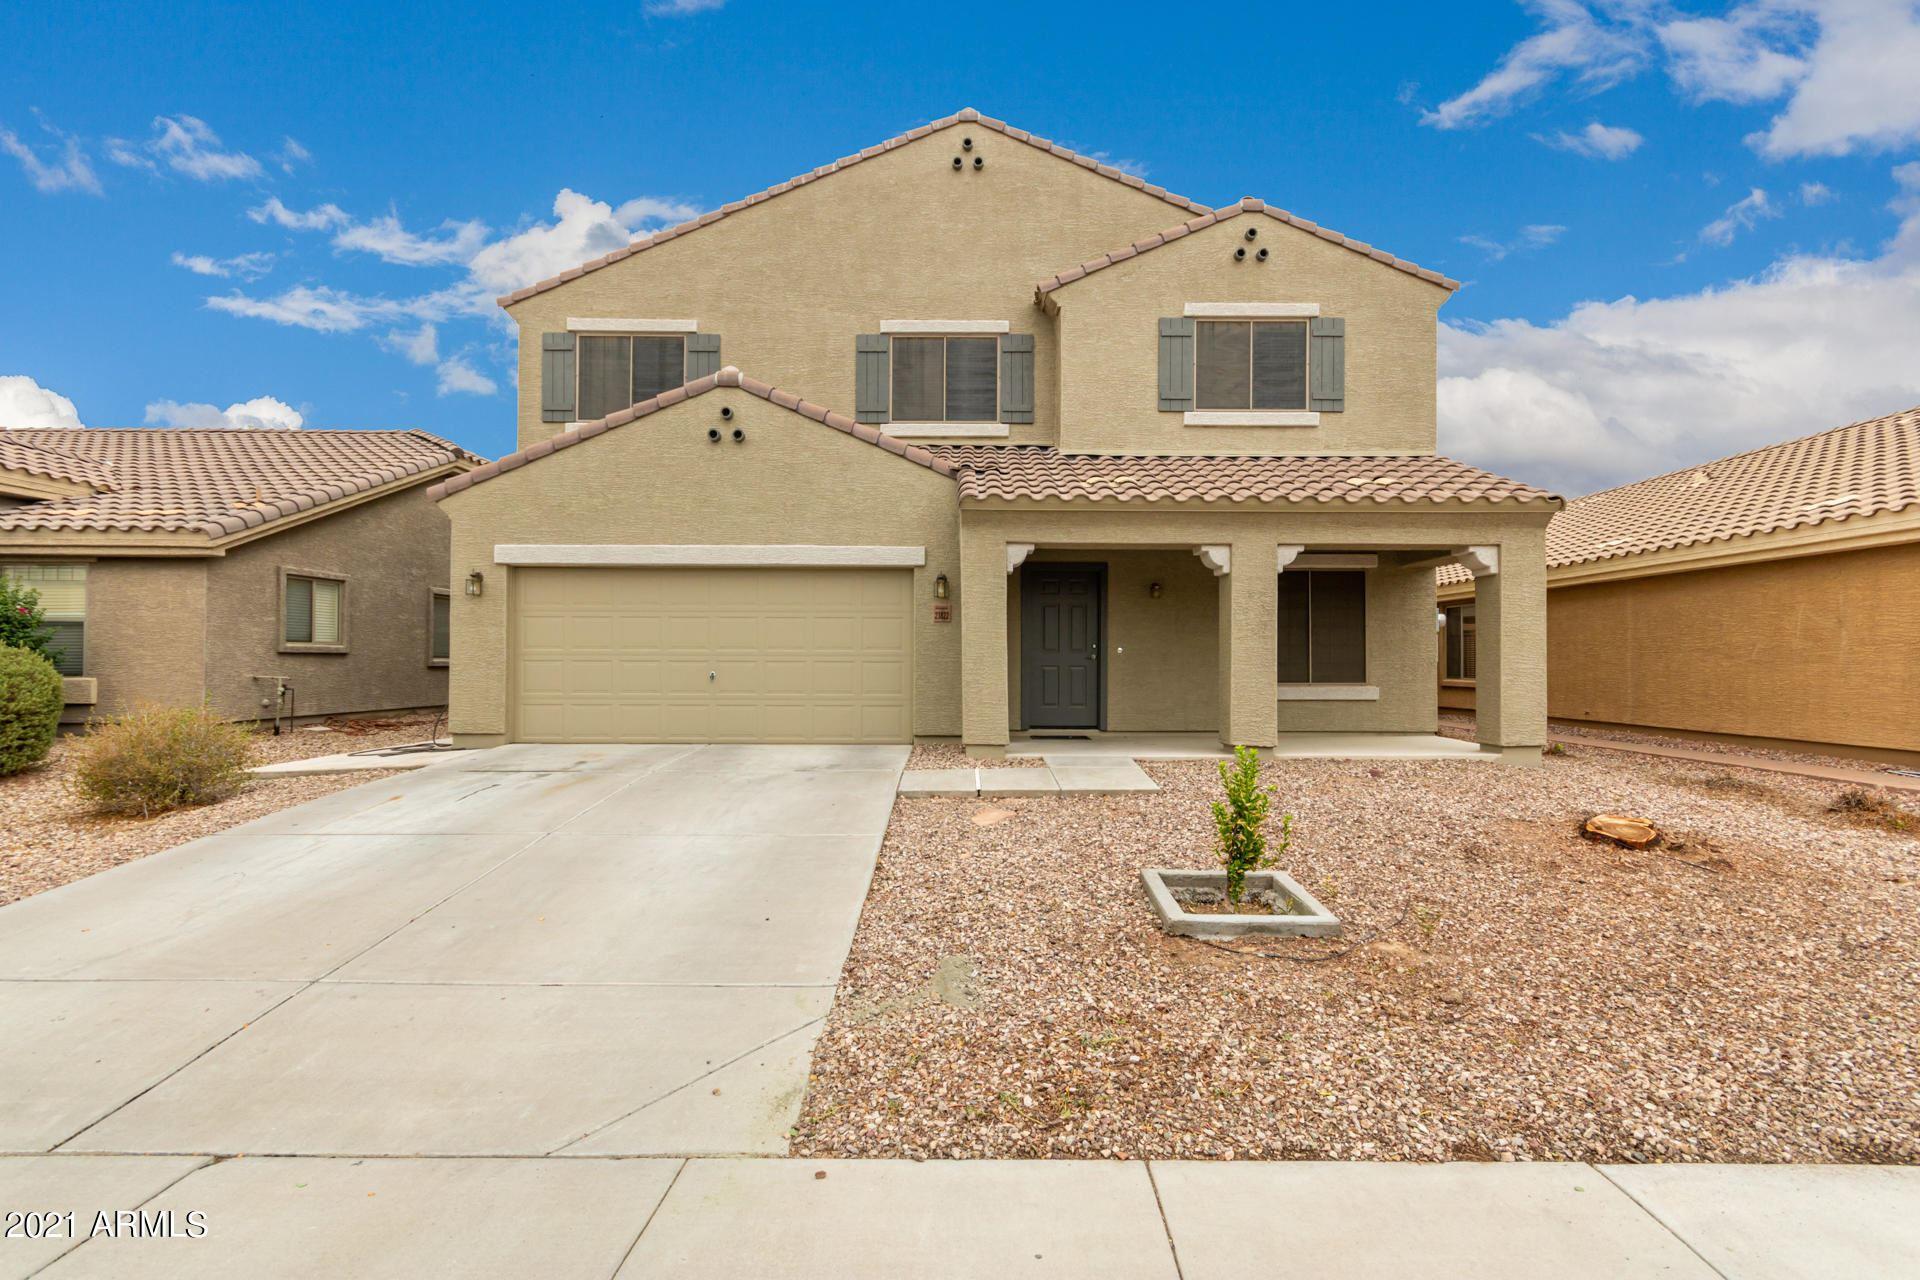 23822 W CHAMBERS Street, Buckeye, AZ 85326 - MLS#: 6269387